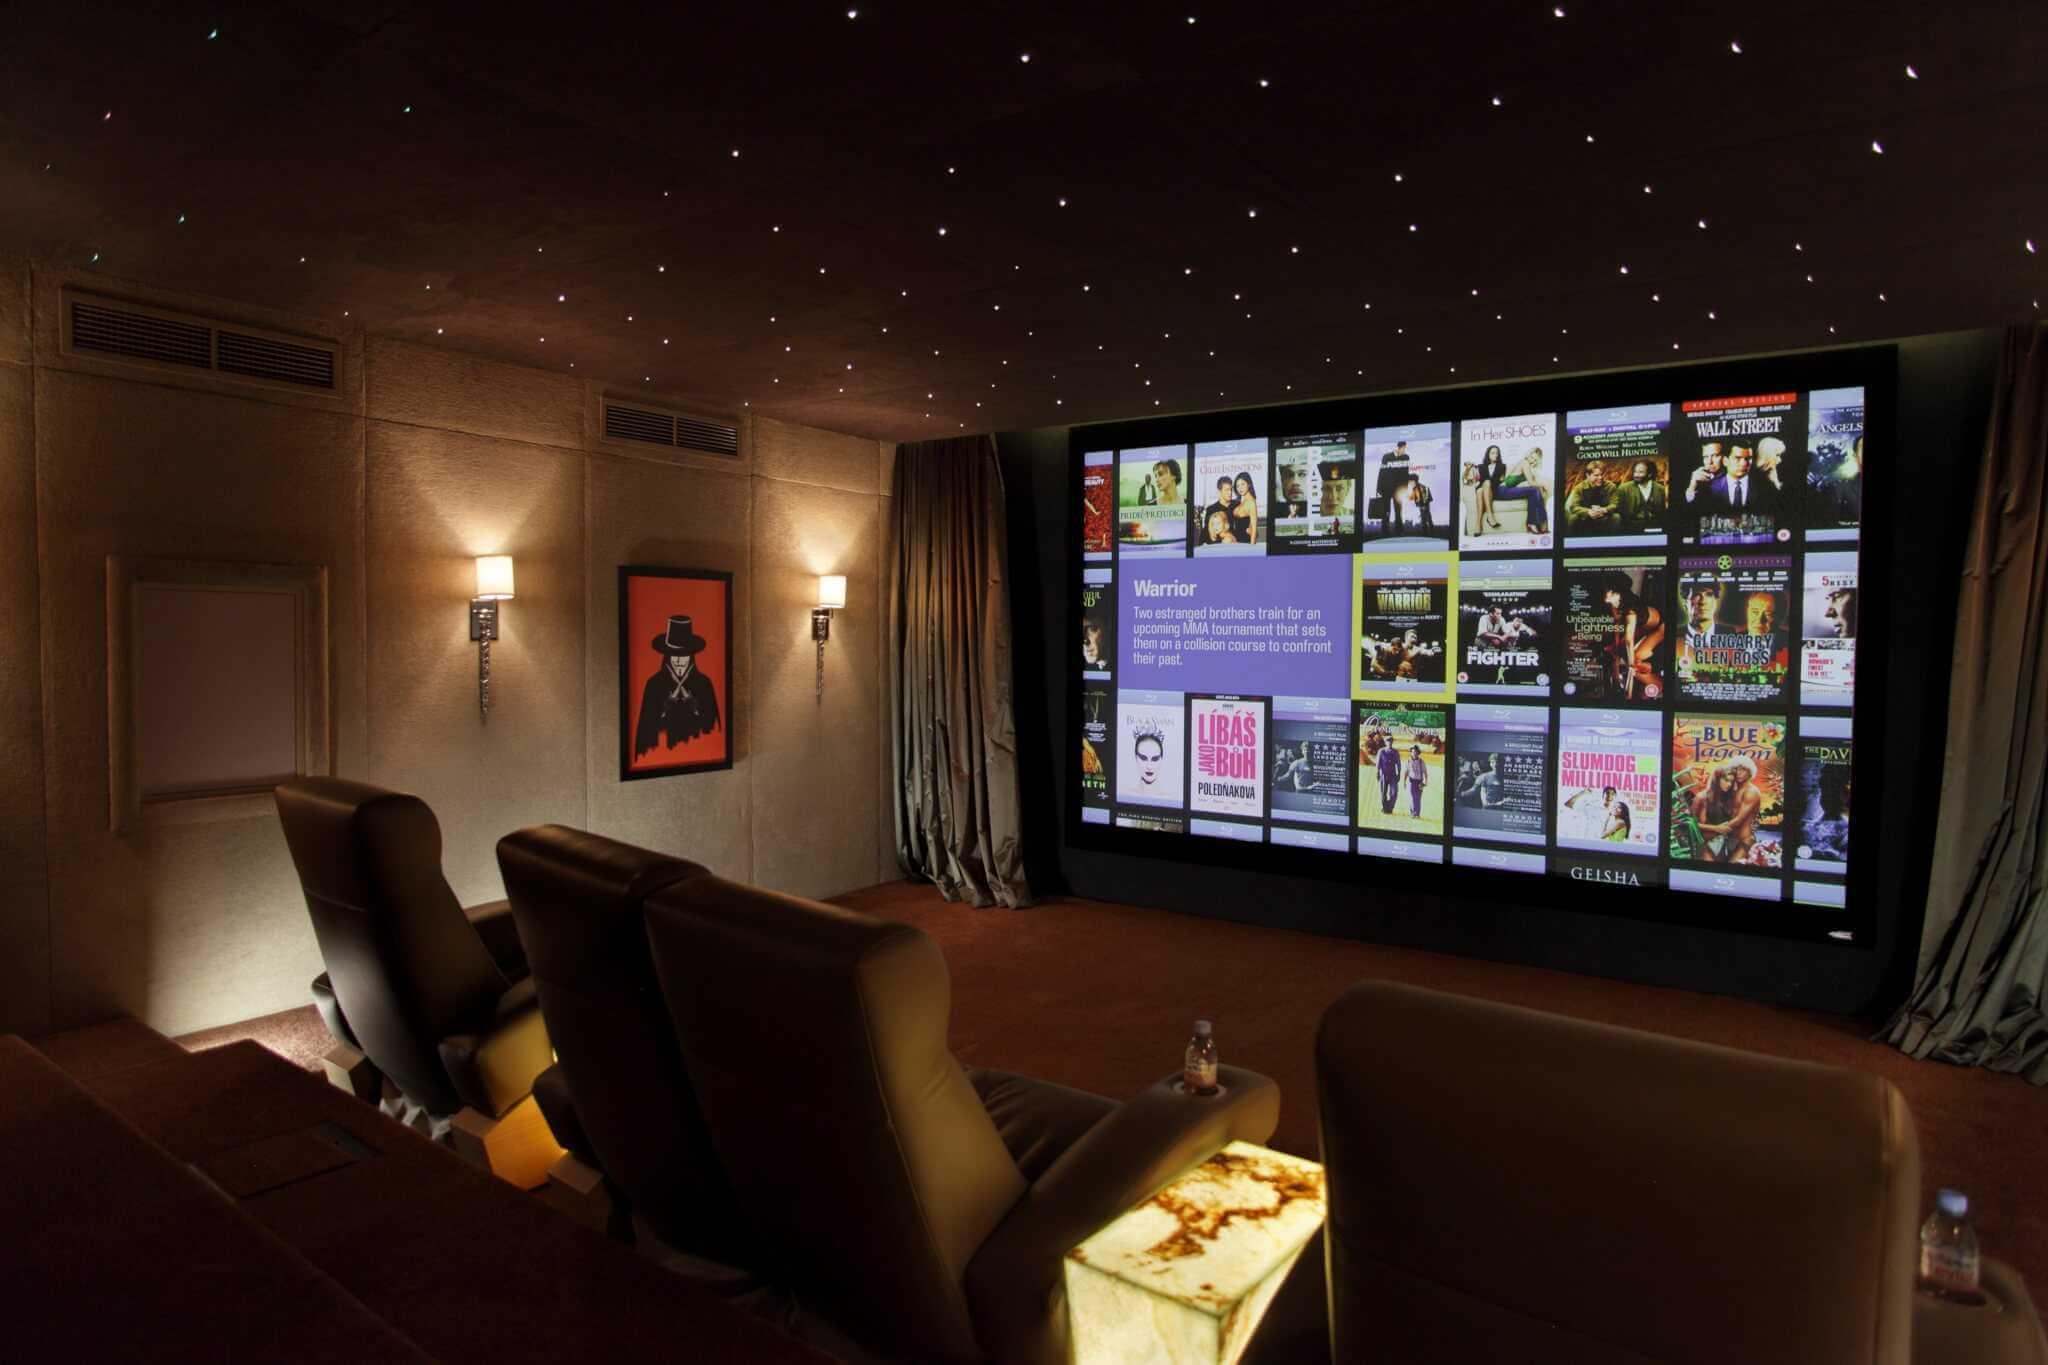 Dubai Home Cinema - Showing Kaleidescape